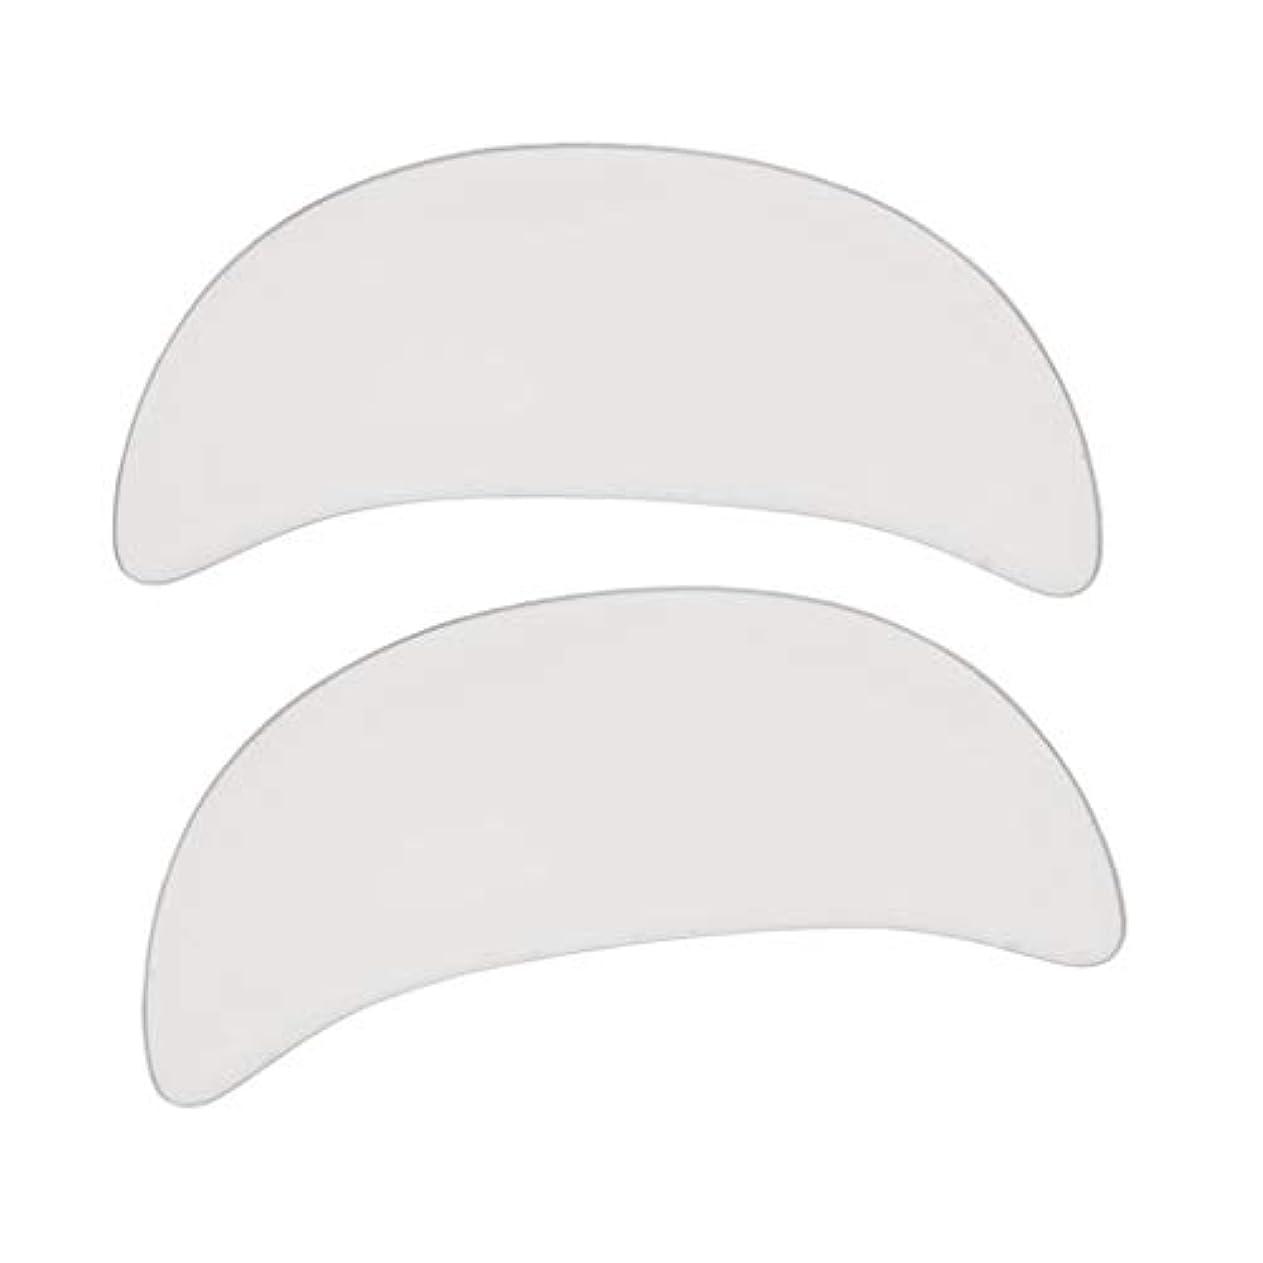 dailymall 2 /セットシリコン再利用可能なアンチリンクルアイフェイスパッドスキンケアマスク